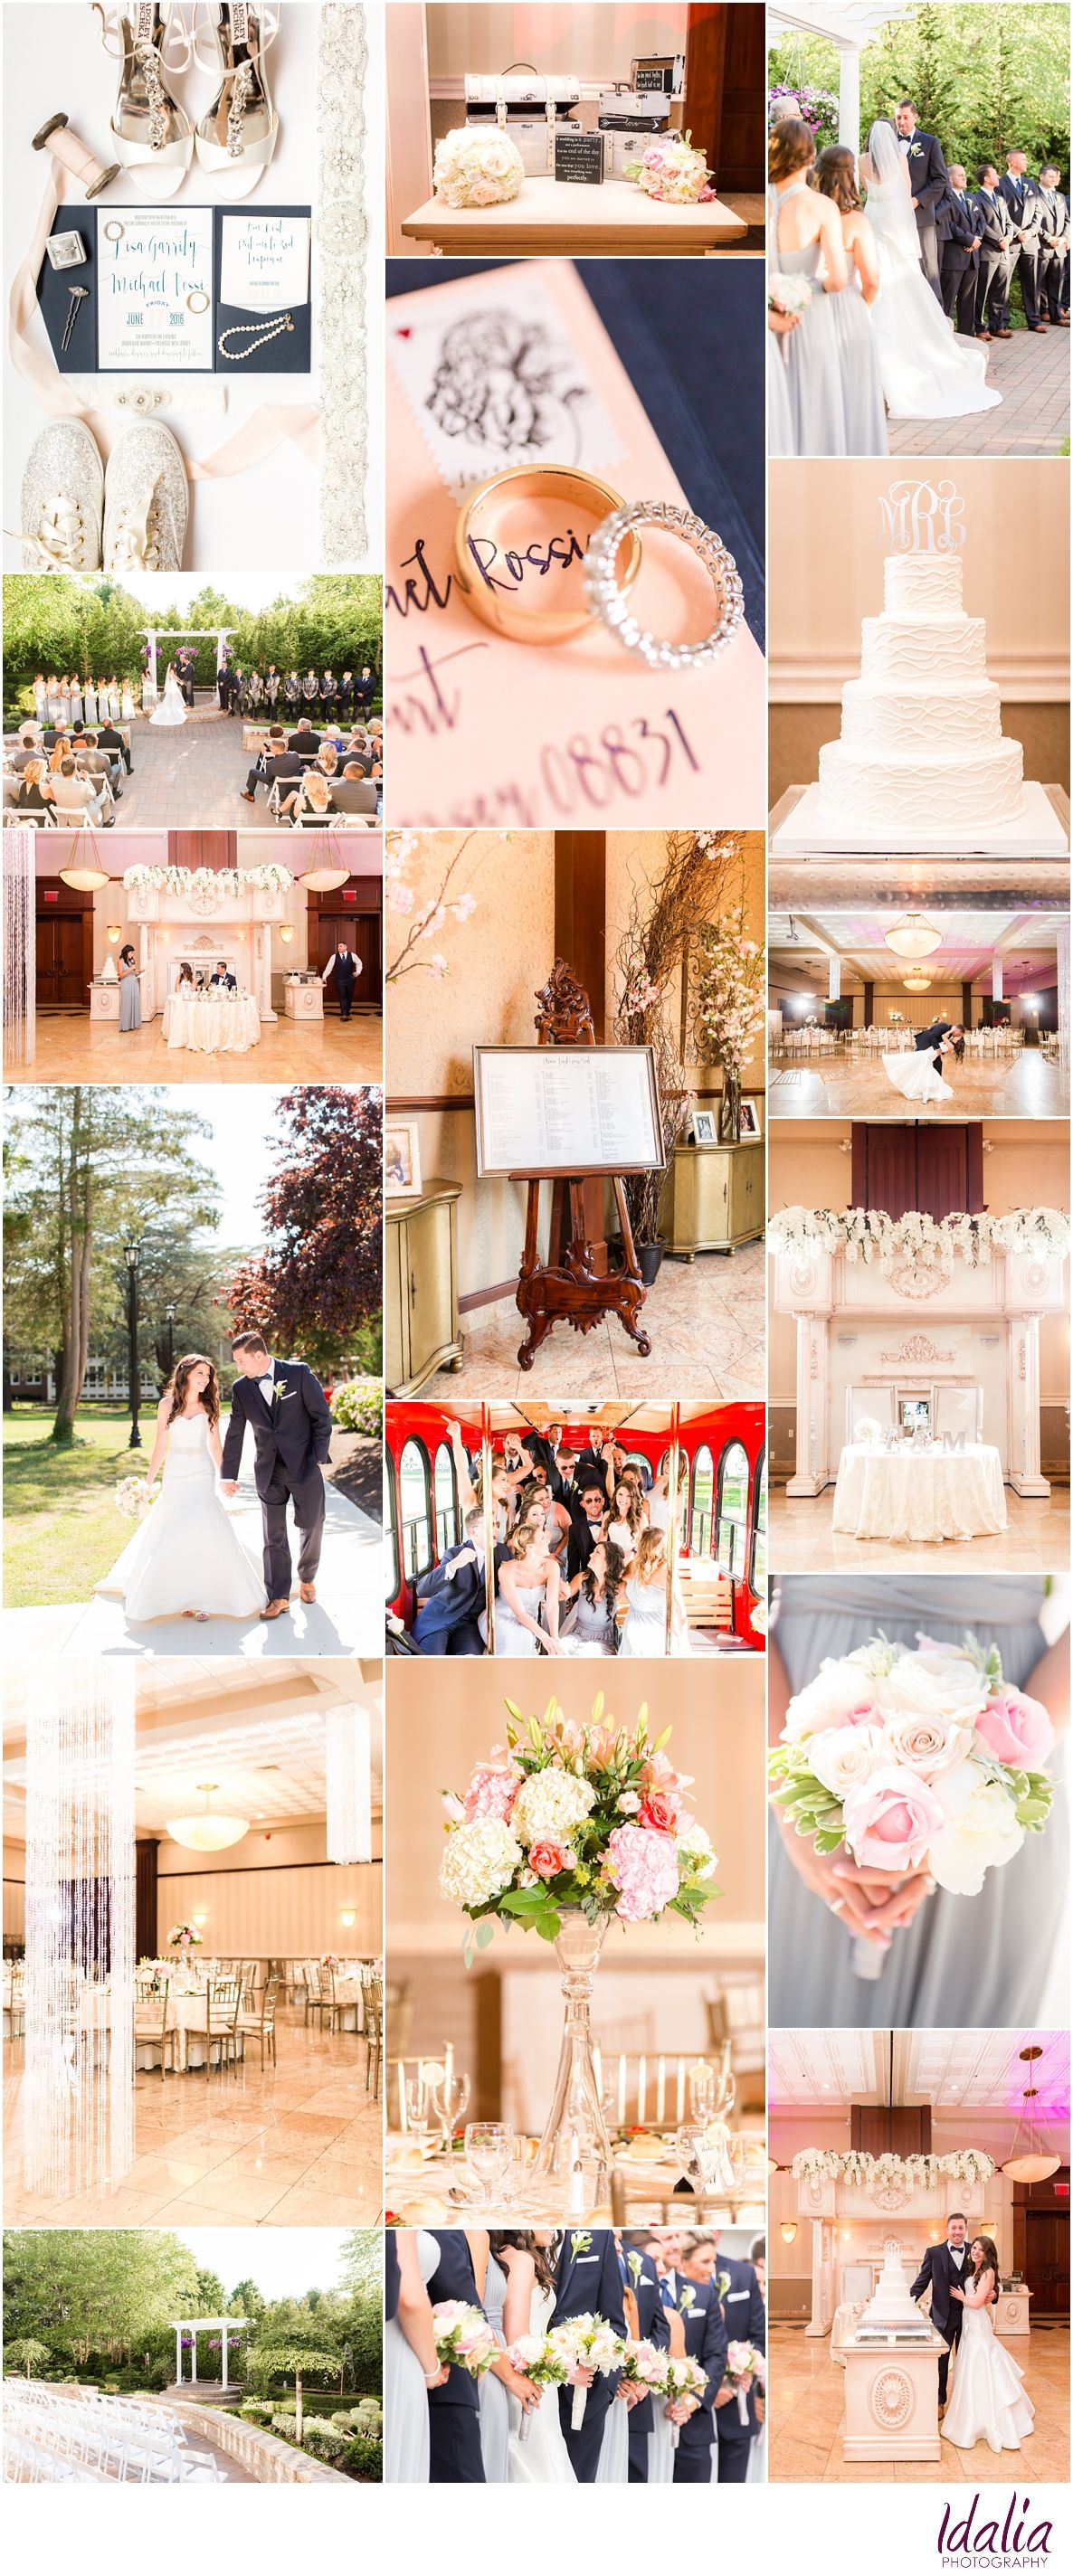 South Gate Manor Nj wedding venues, Nj weddings, Pa